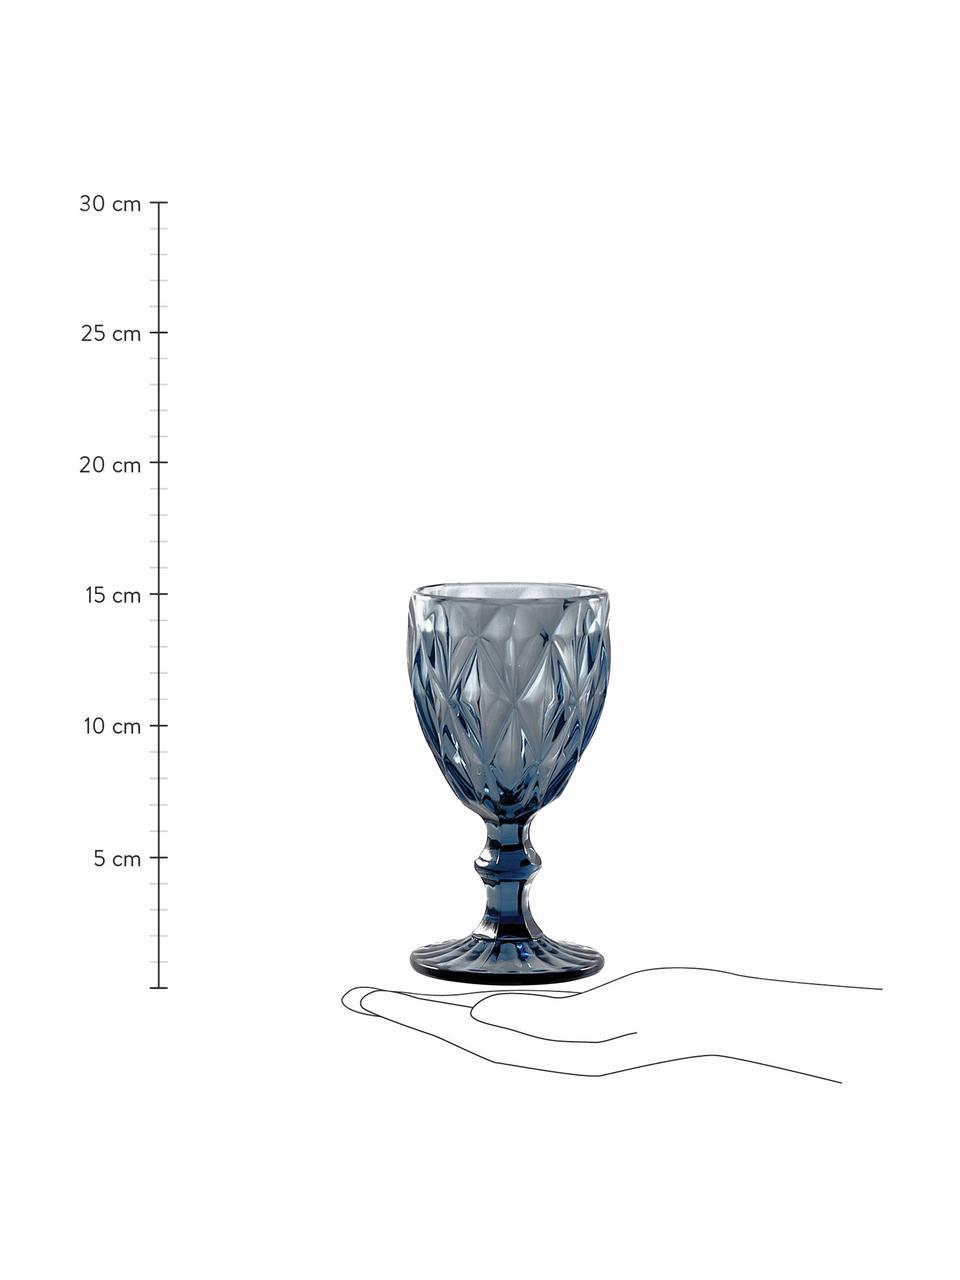 Wijnglazenset Diamond met structuurpatroon, 6-delig, Glas, Blauw, licht transparant, Ø 8 x H 16 cm